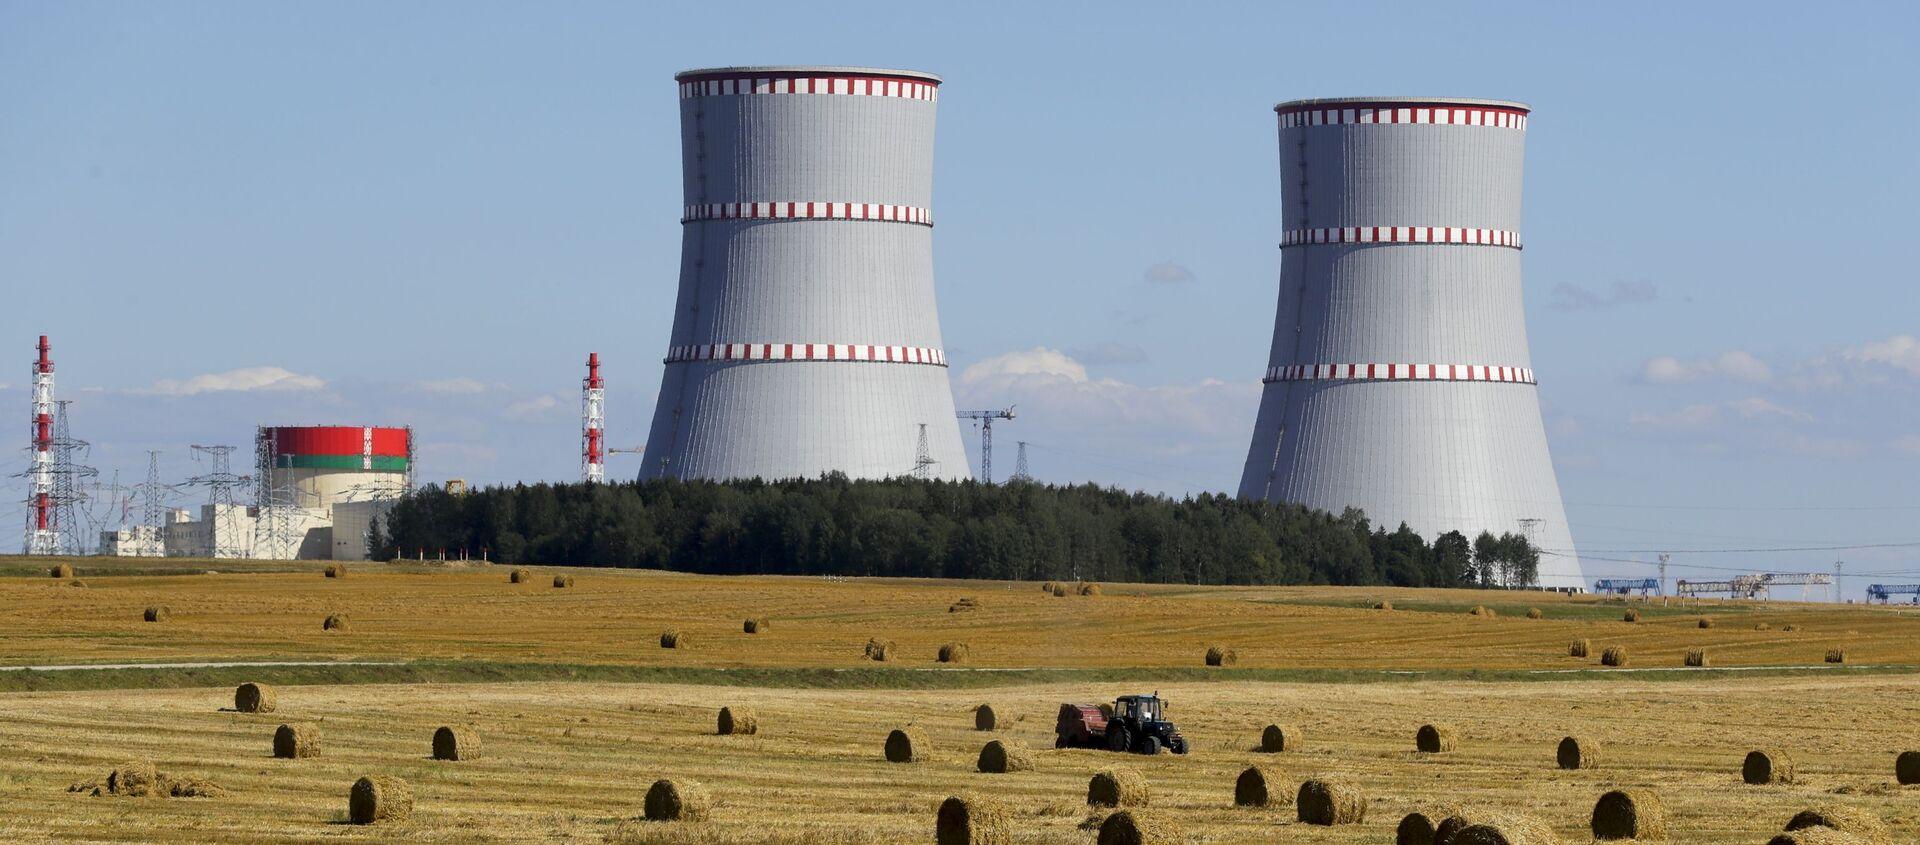 Białoruska Elektrownia Jądrowa. - Sputnik Polska, 1920, 03.06.2021